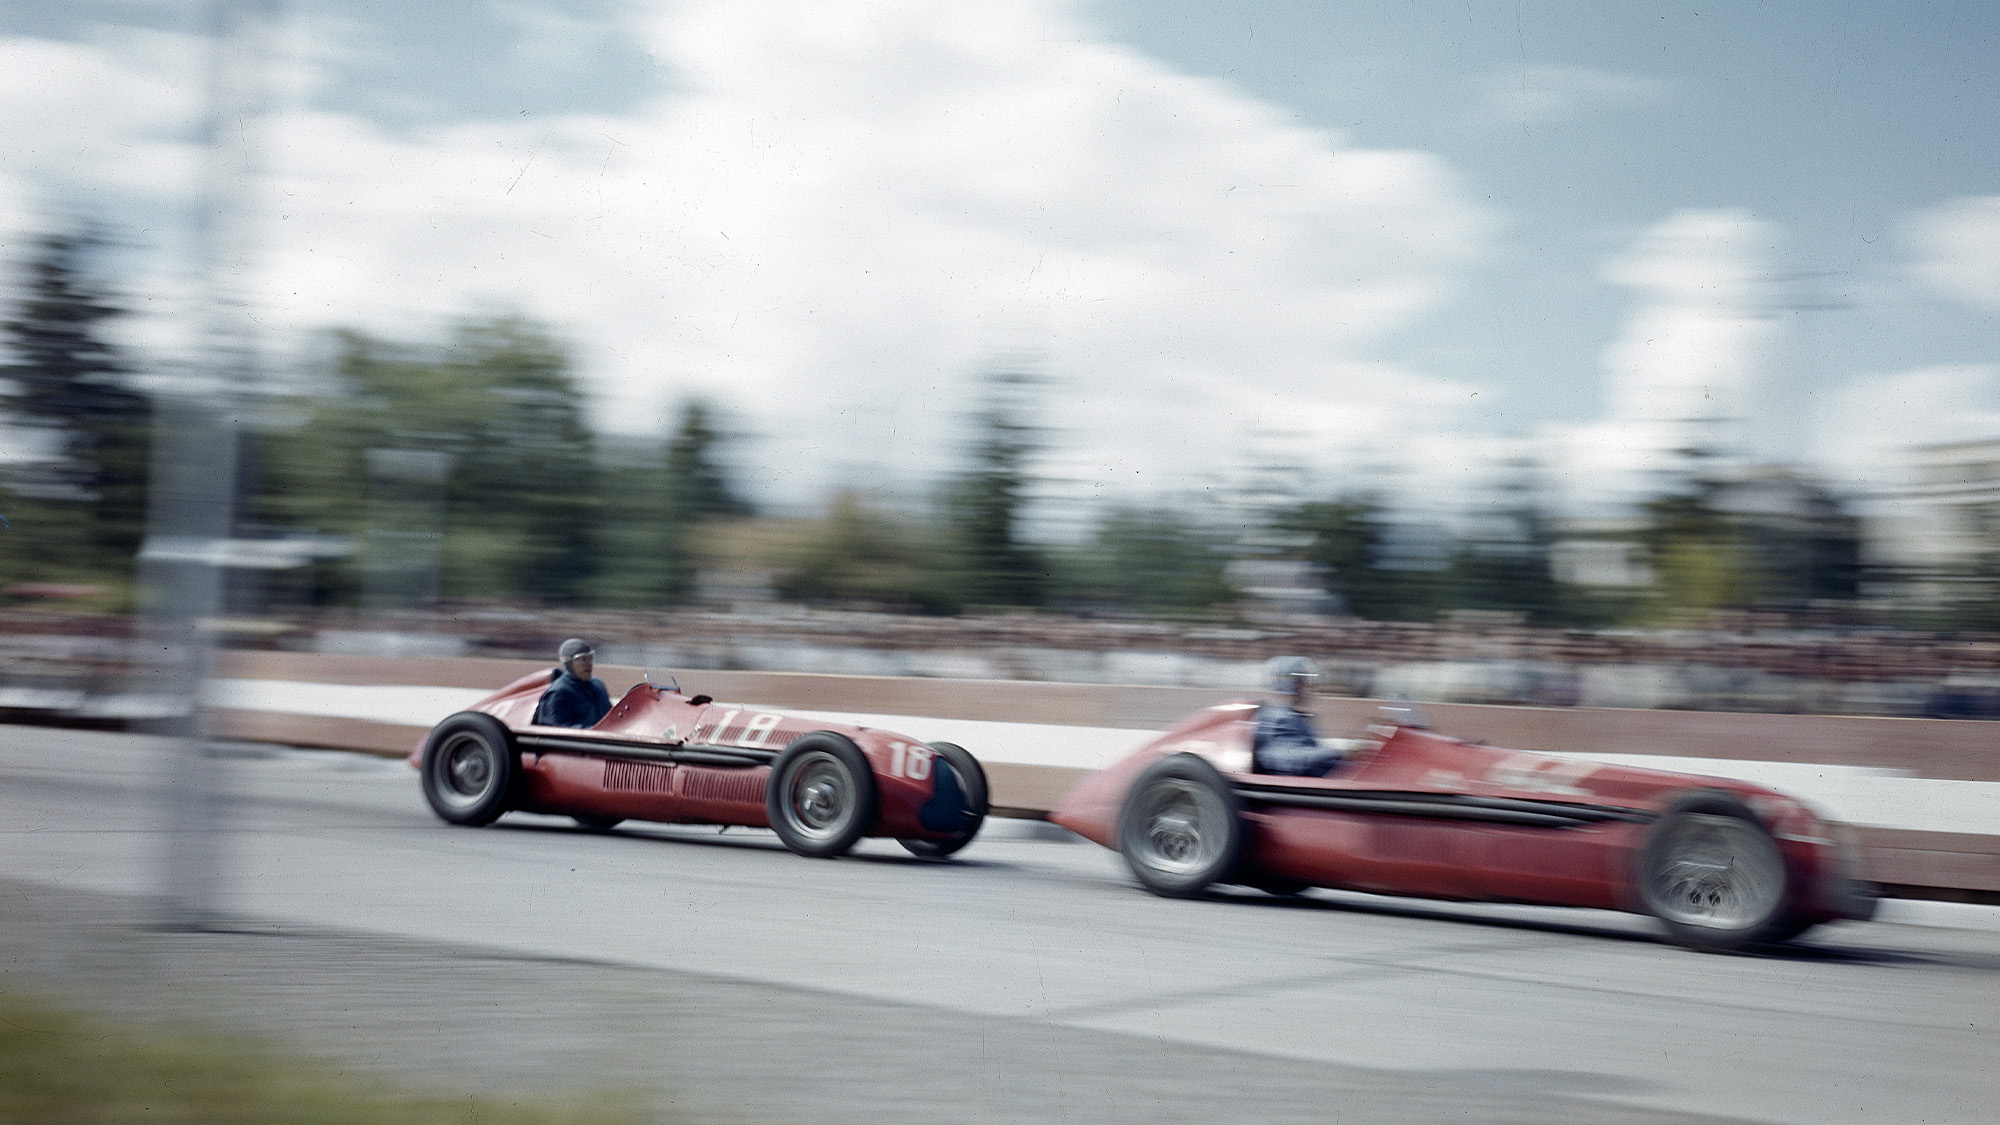 Jean-Pierre Wimille leads Alfa romeo 158 team-mate Giuseppe Farina at the 1946 Grand Prix des Nations in Geneva